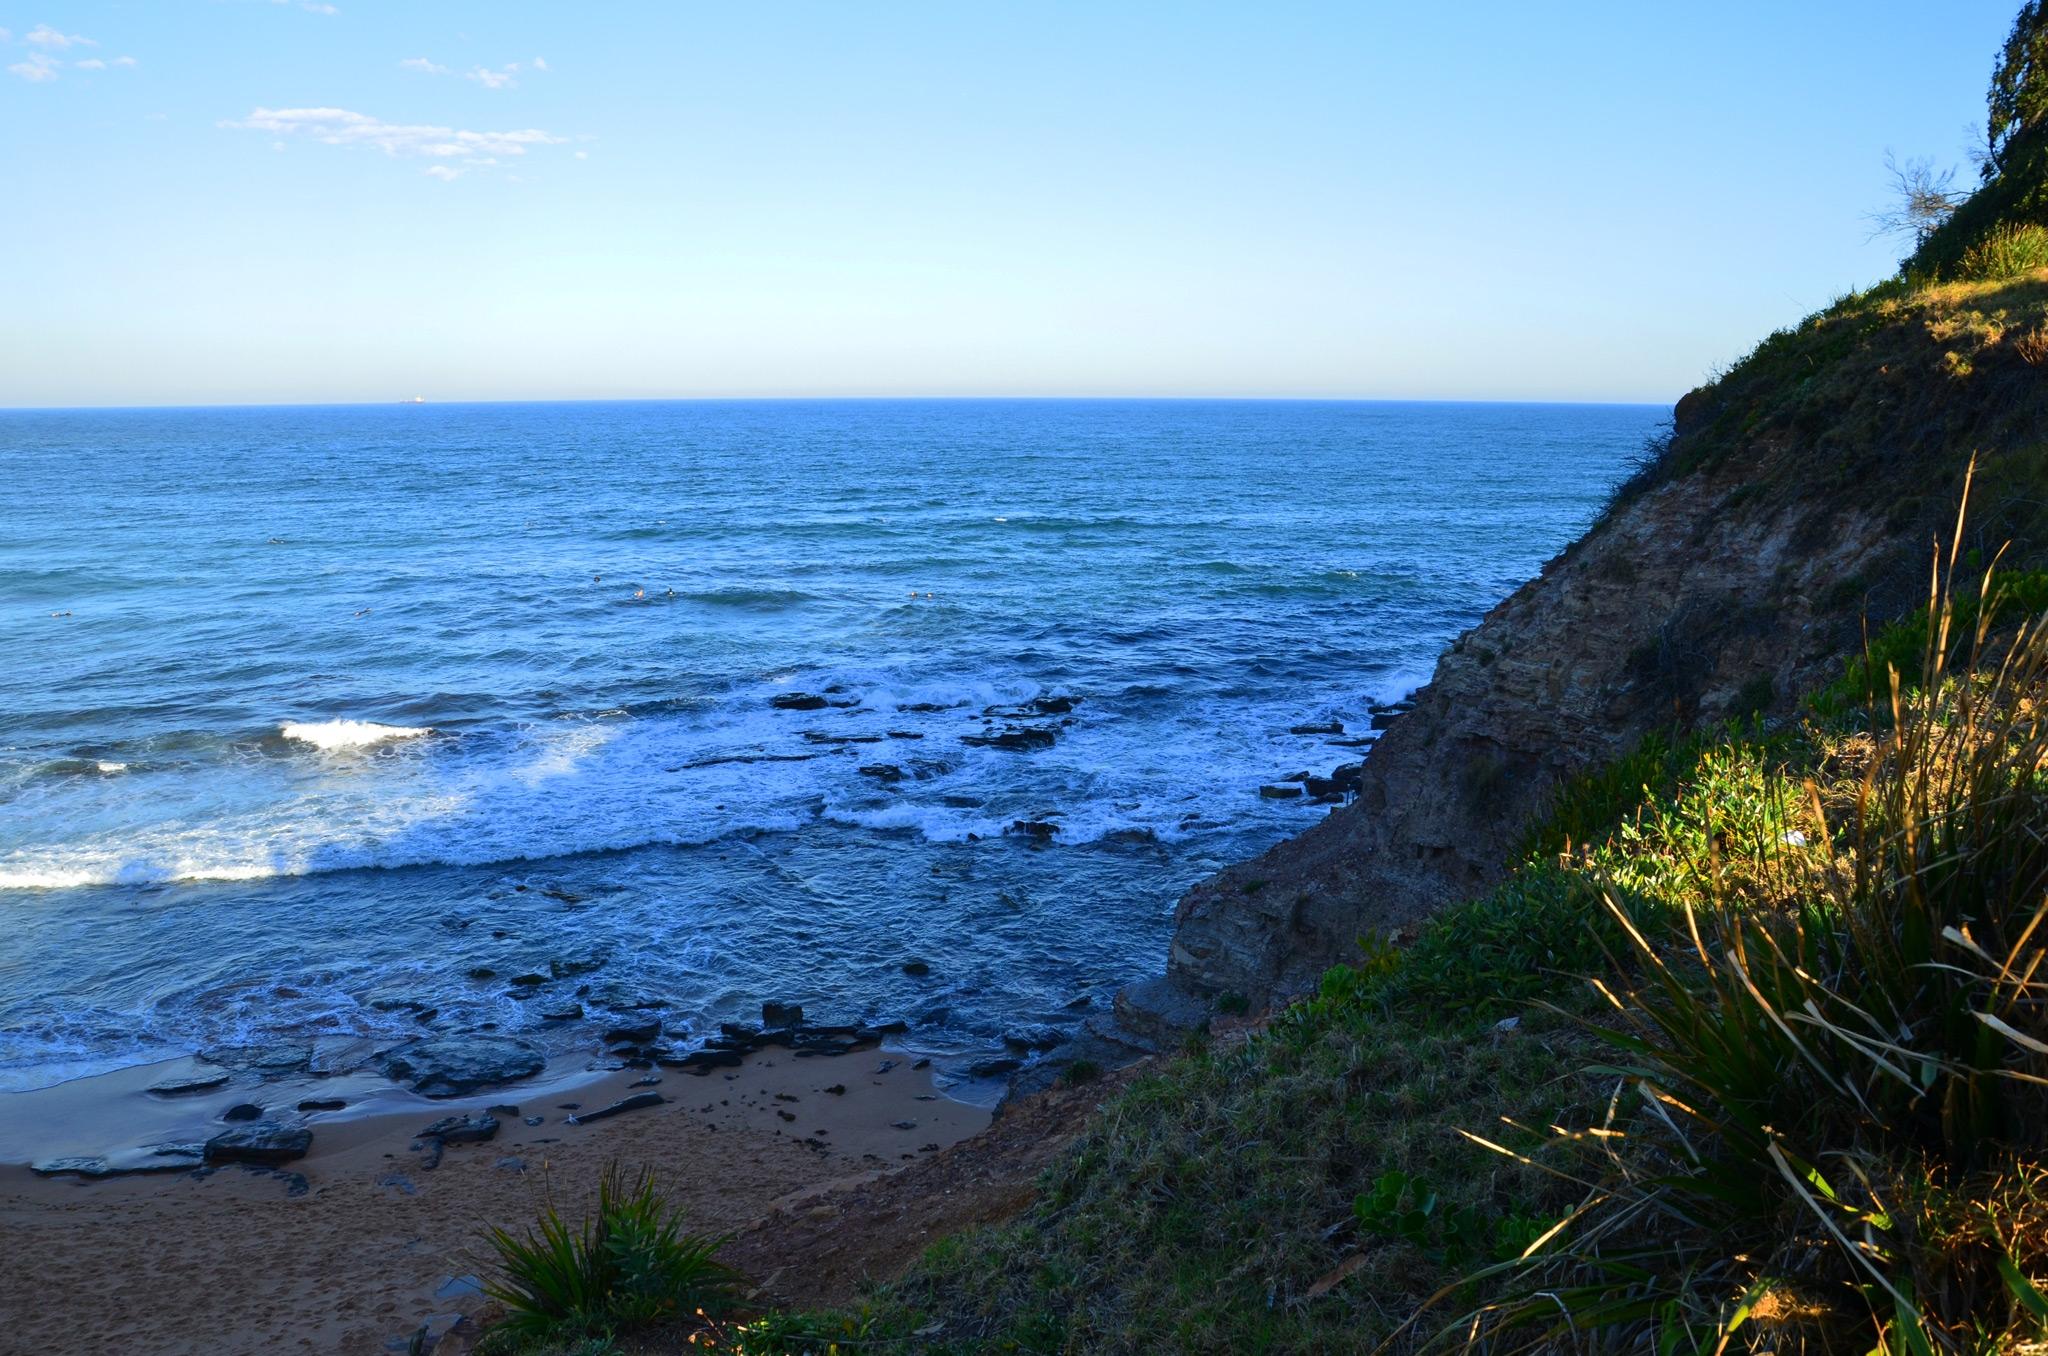 Avalon Beach - Image ©2014 ManlyAustralia.com